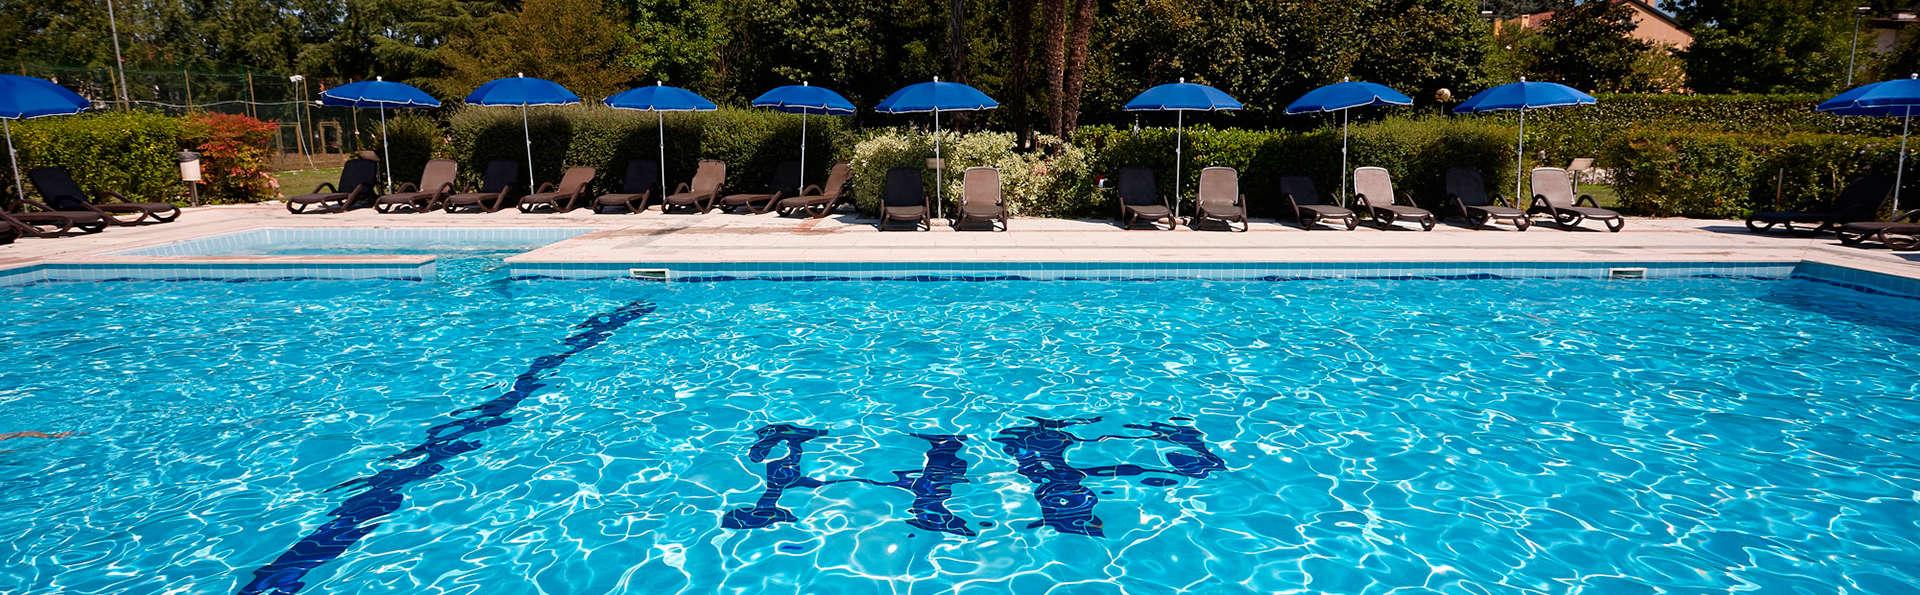 Villa Patriarca Hotel - EDIT_NEW_pool.jpg